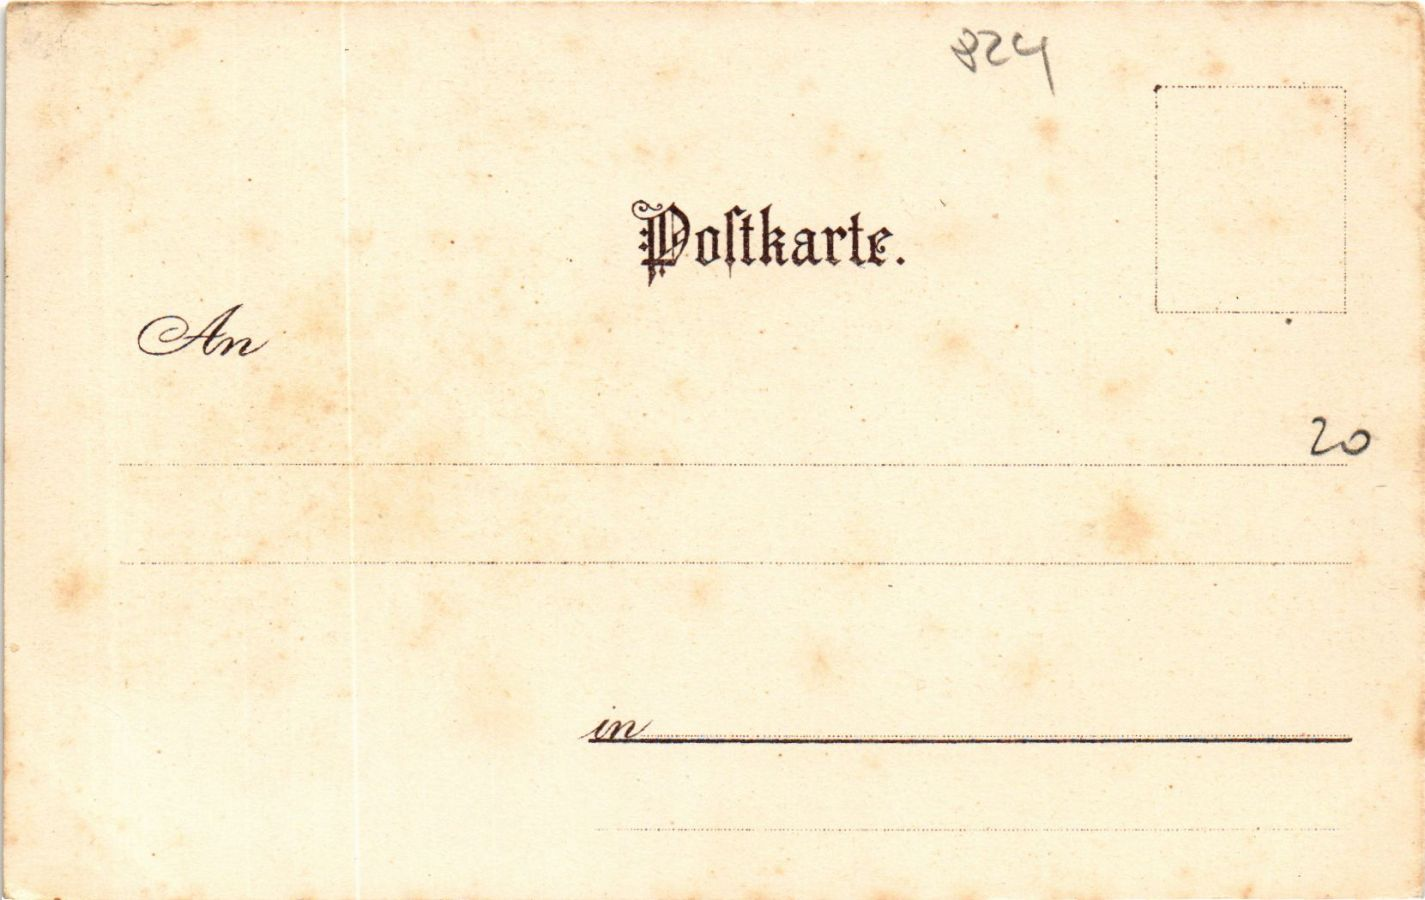 CPA-AK-Konigssee-Malerwinkel-GERMANY-879433 miniature 2